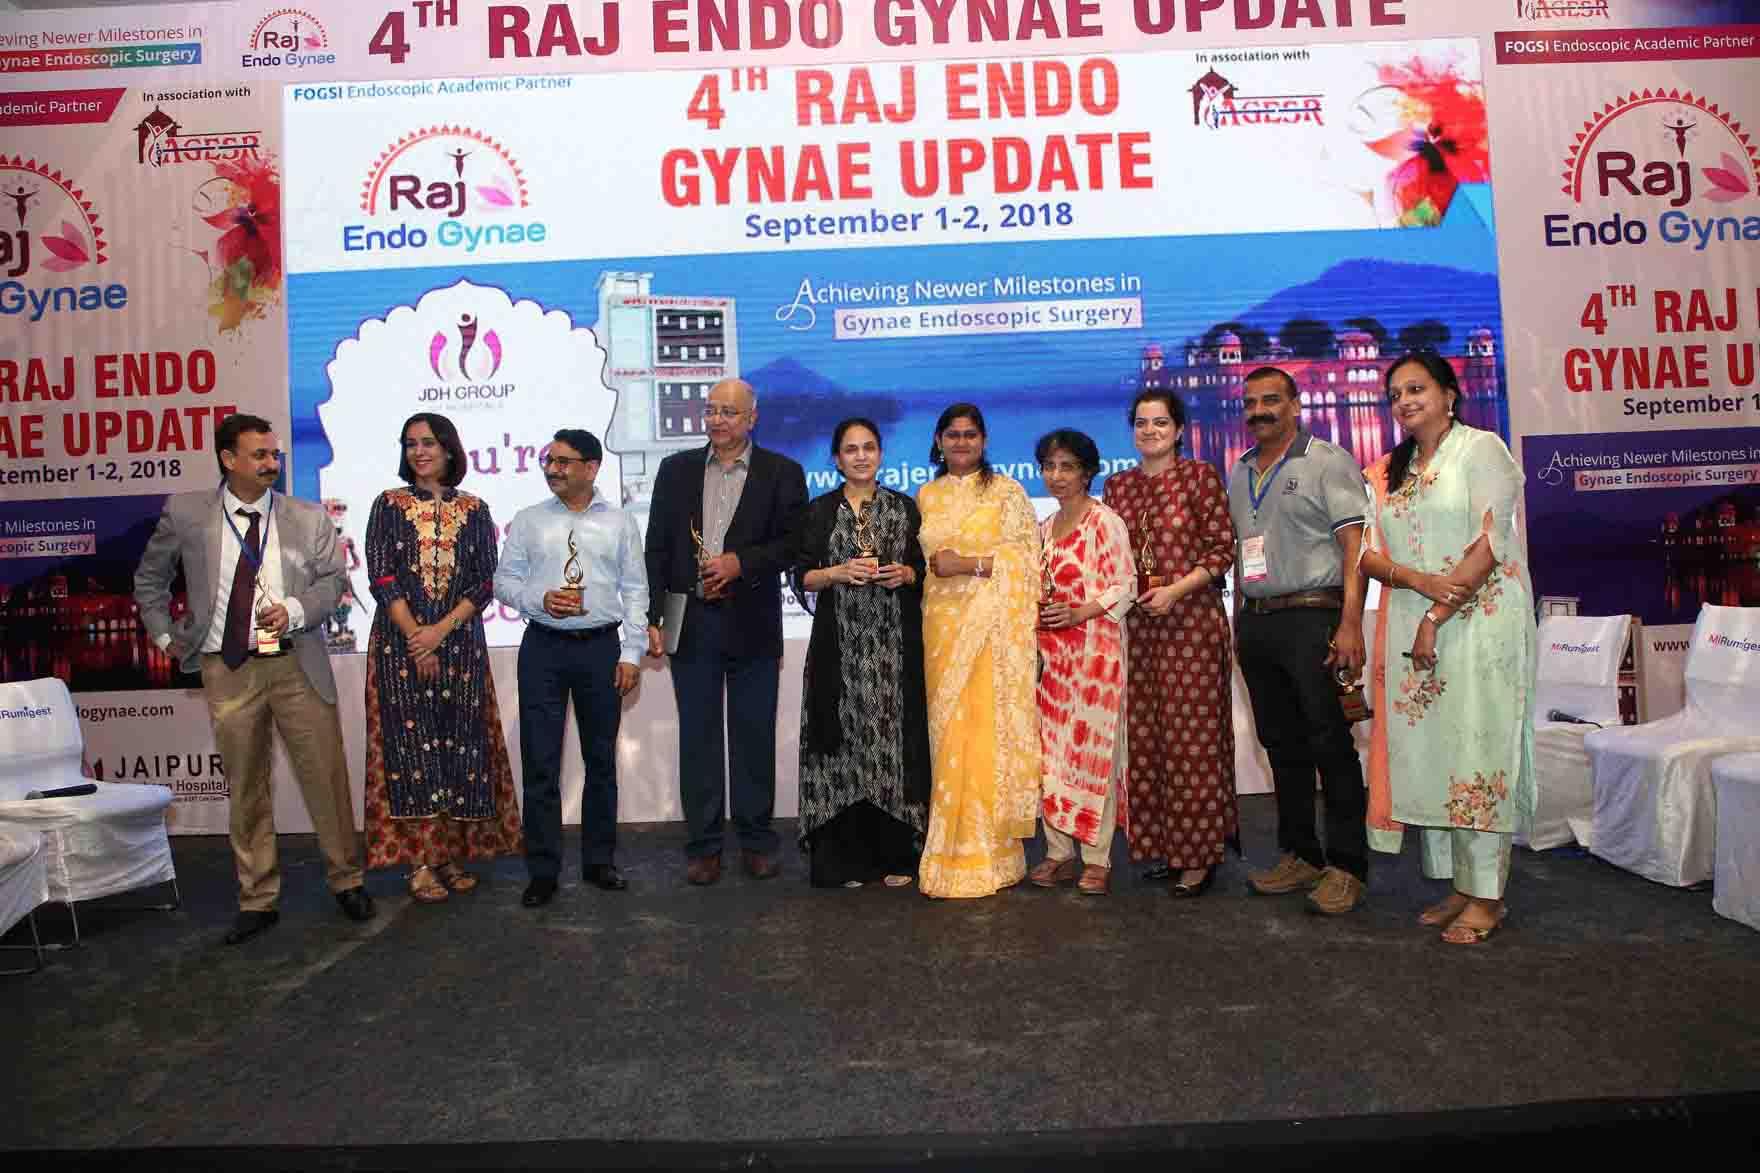 Raj Endo Gynae Update 2018